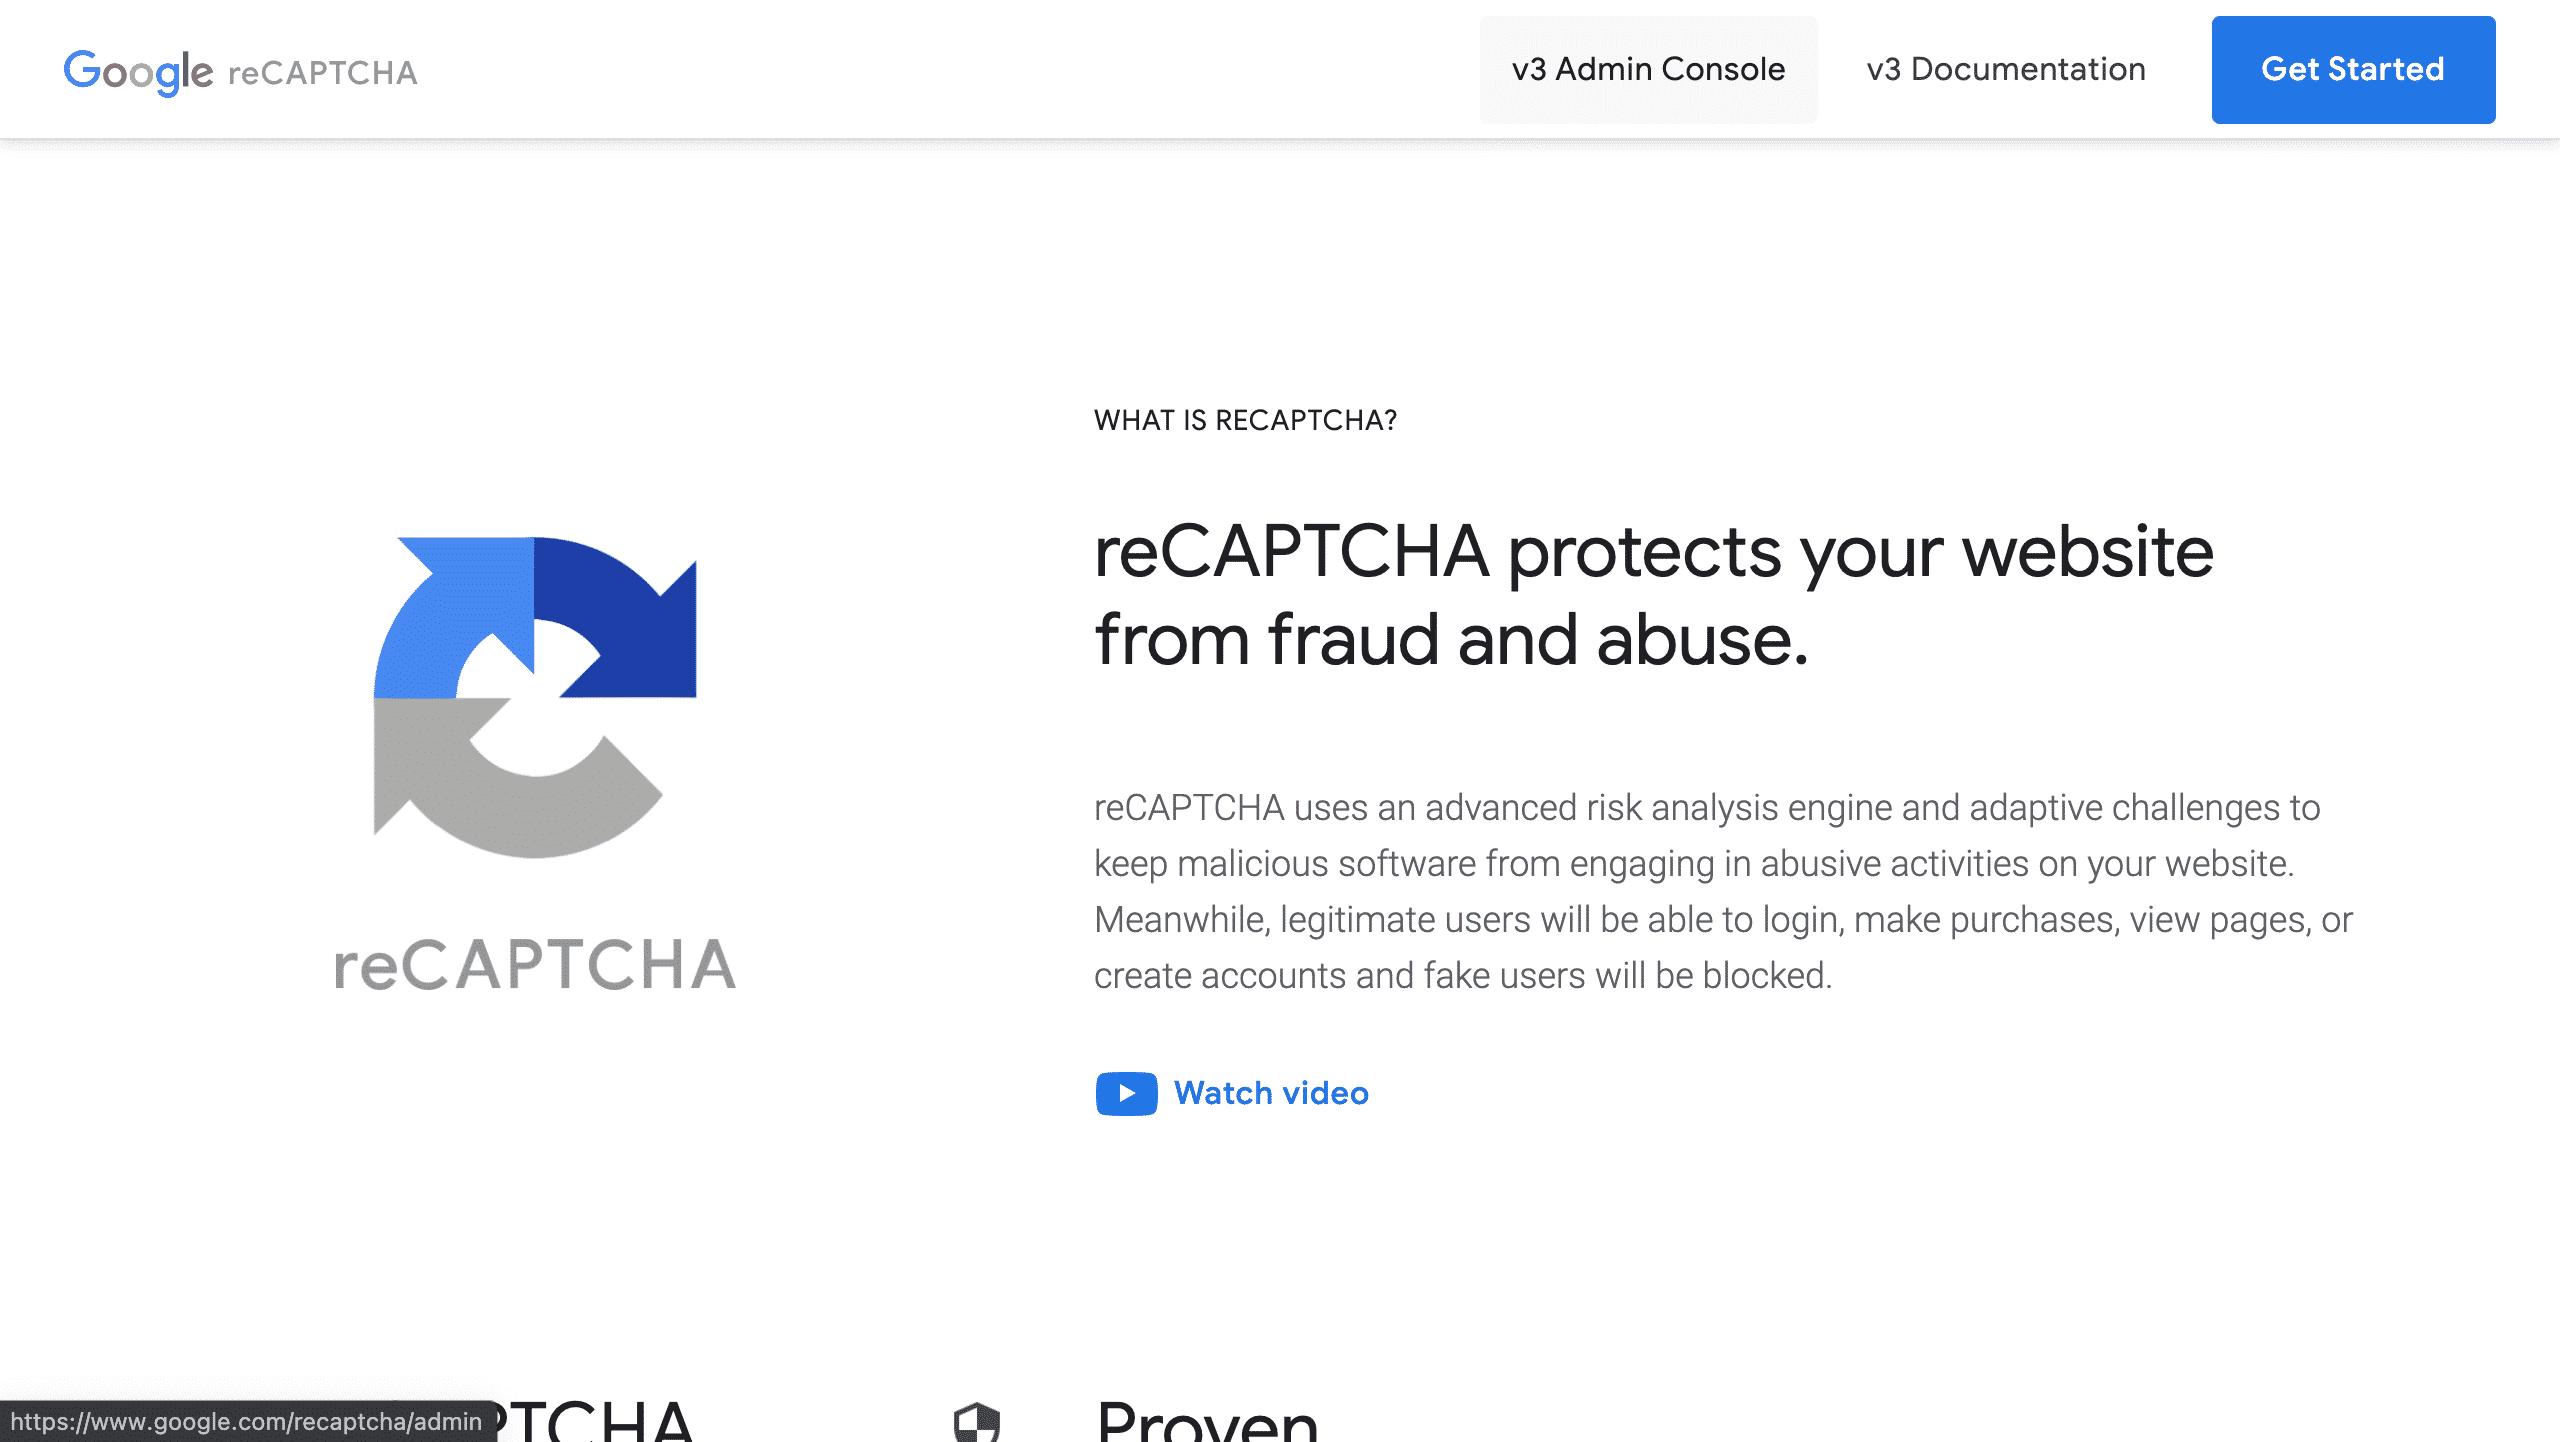 Google recaptcha homepage screenshot conor bradley digital agency